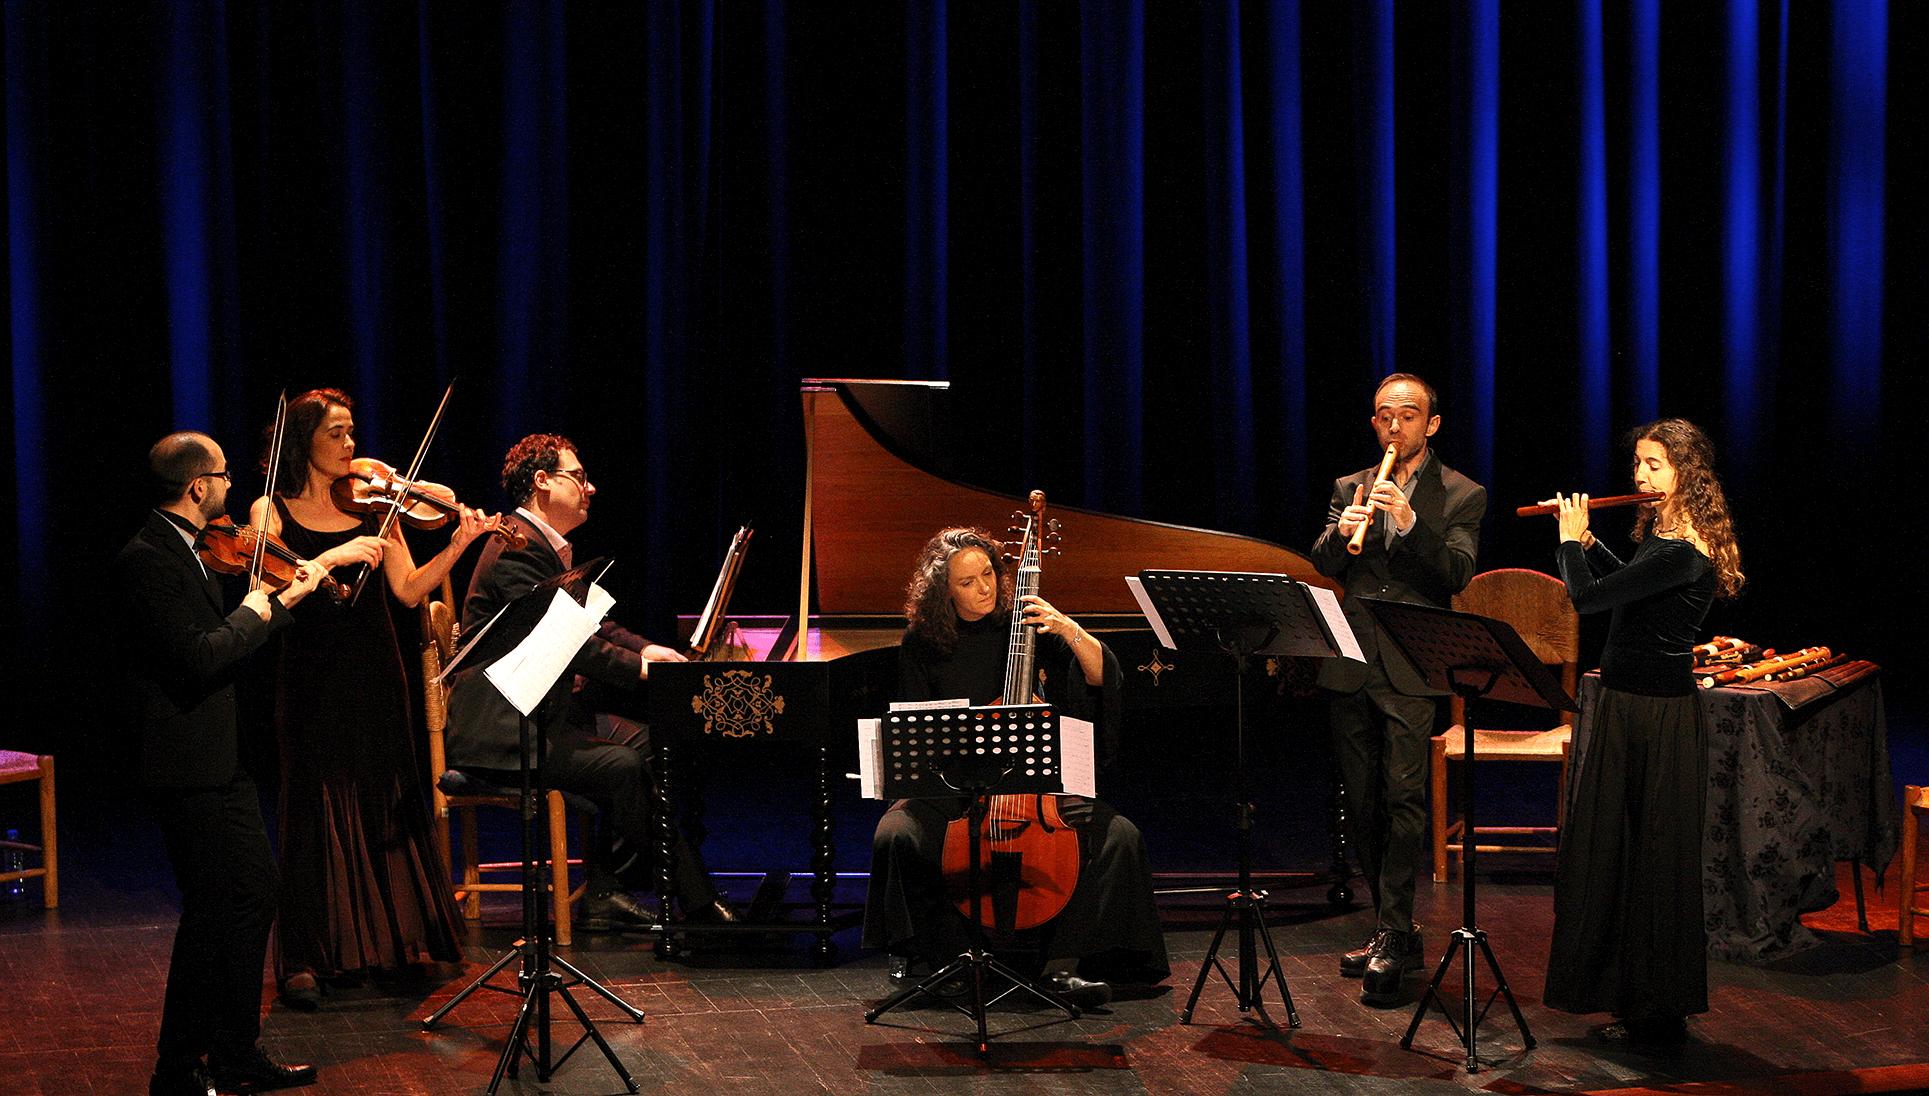 Lodovice-Ensemble-Festival-Terras-Sem-Sombra-02-06-2018-Barrancos-41-cópia